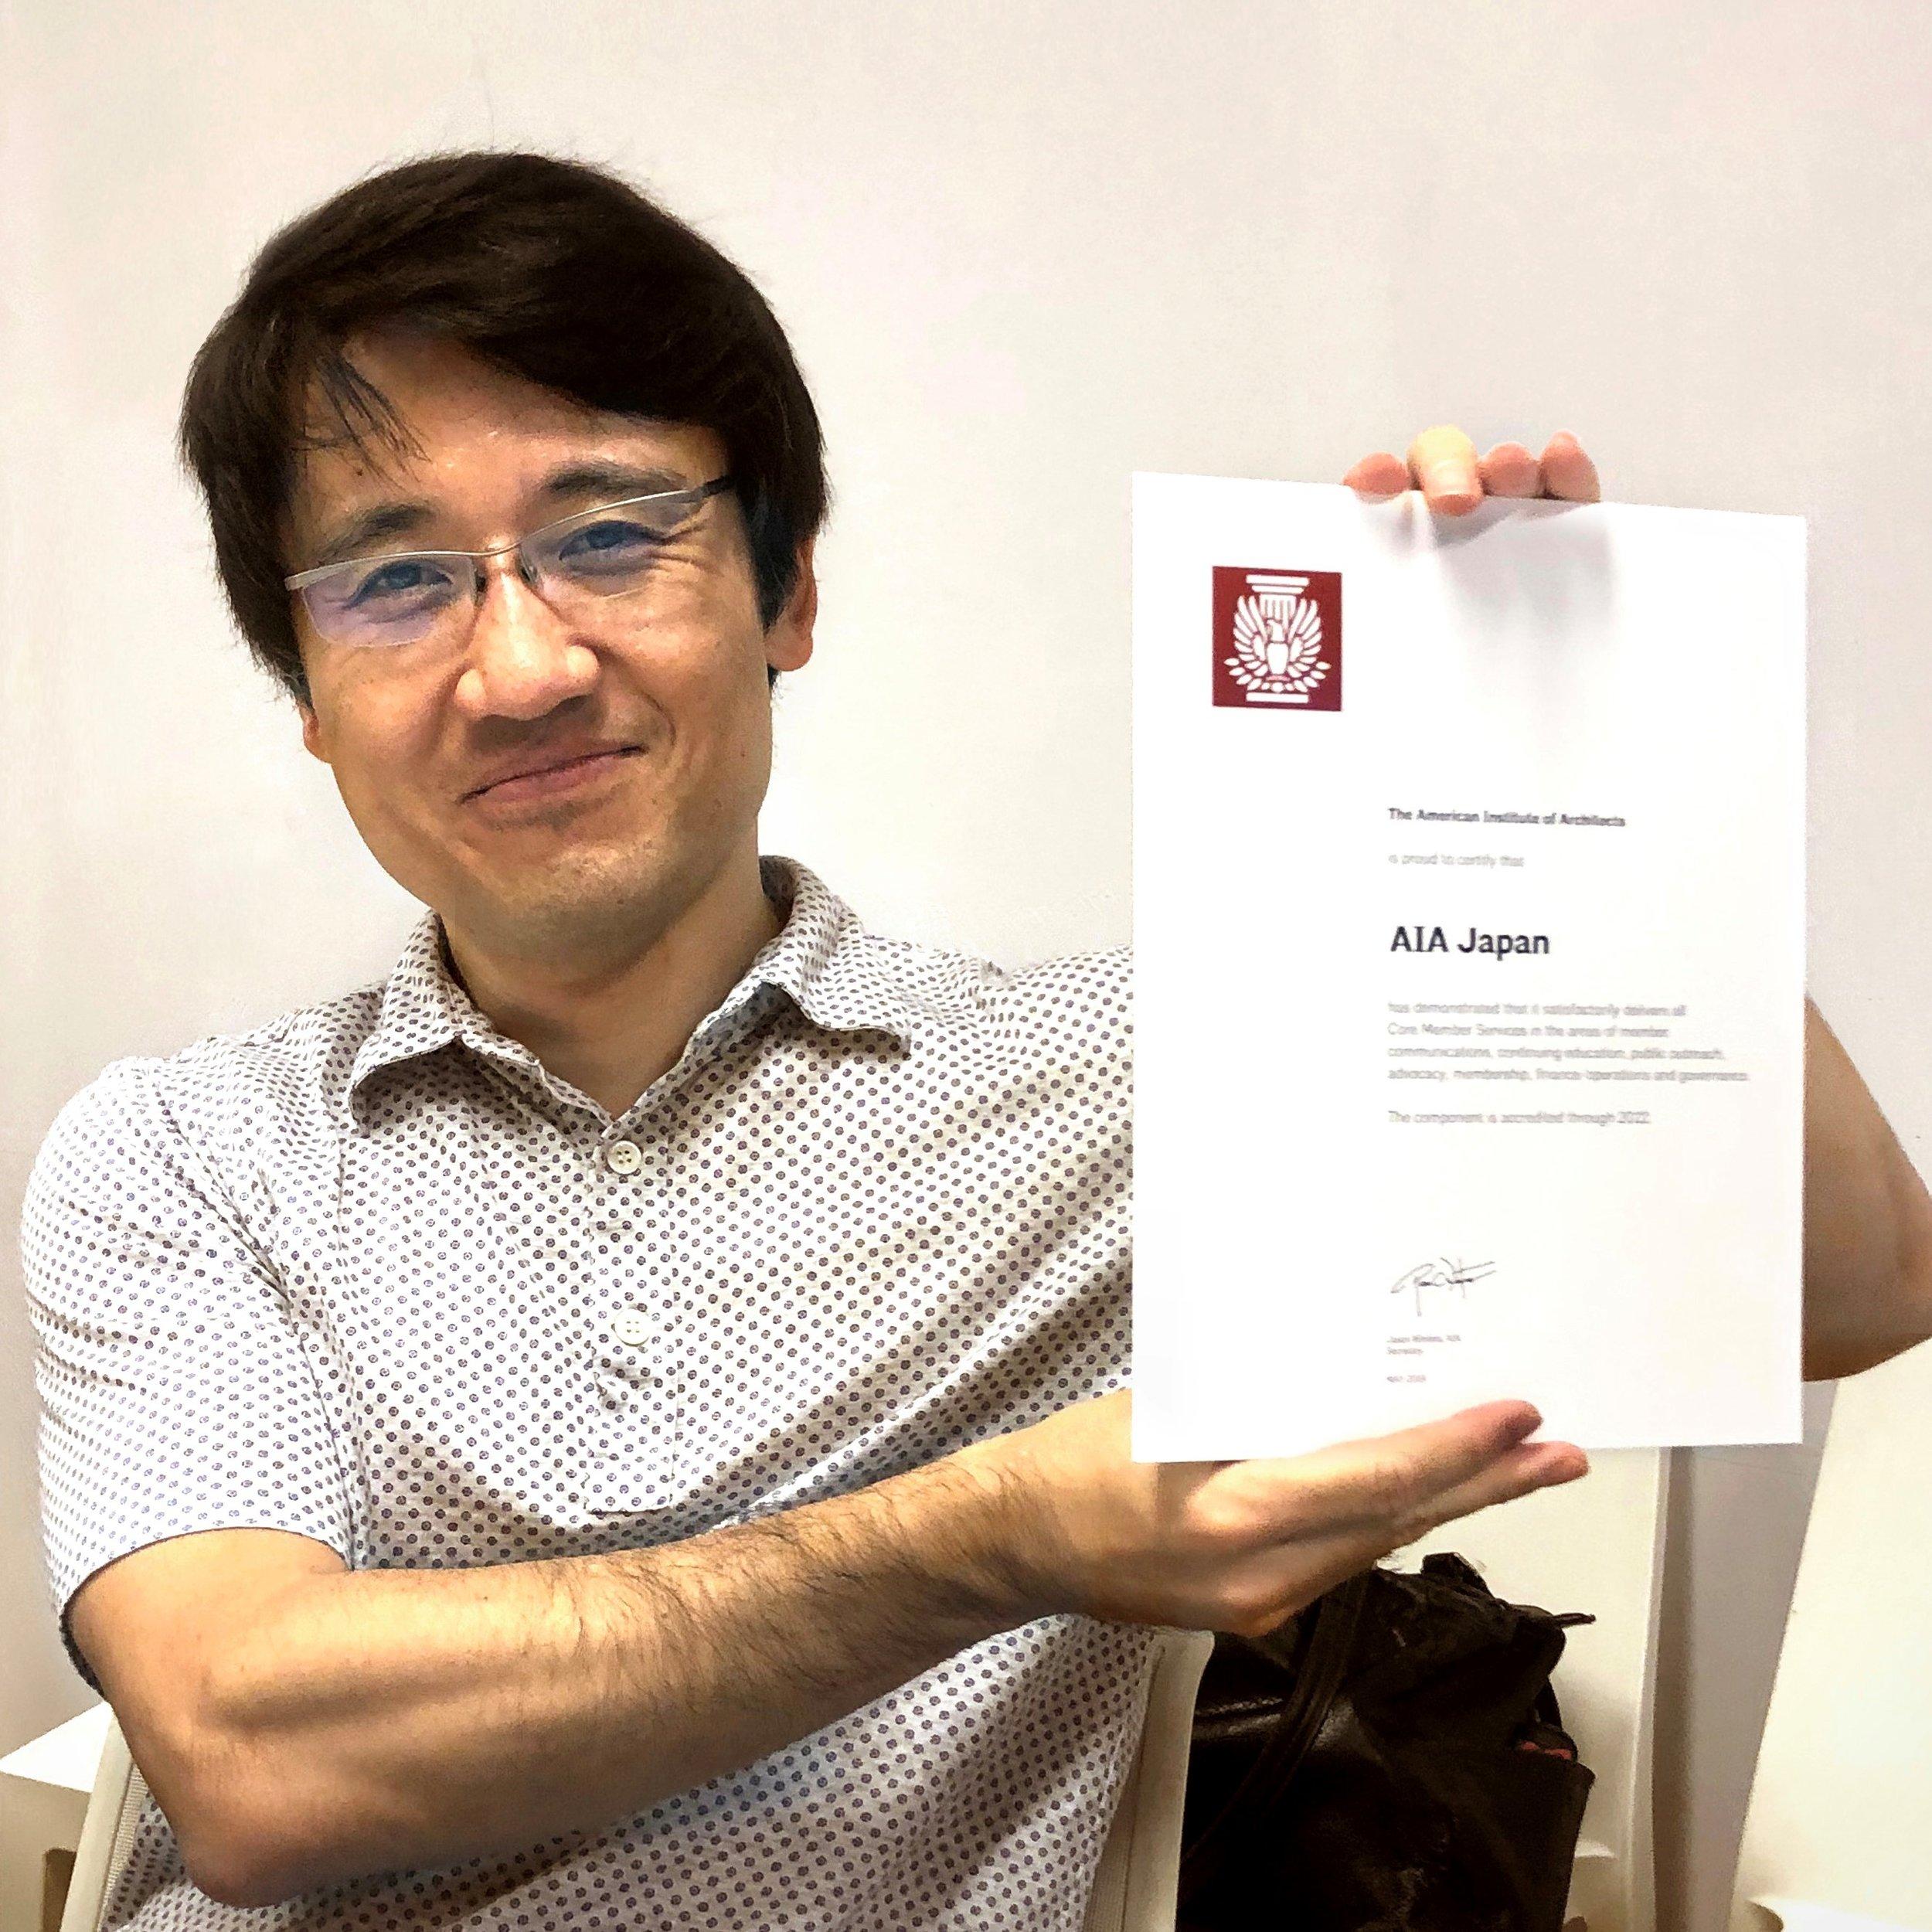 2018 AIA Japan President Daishi Yoshimoto holds the Accreditation Certificate.